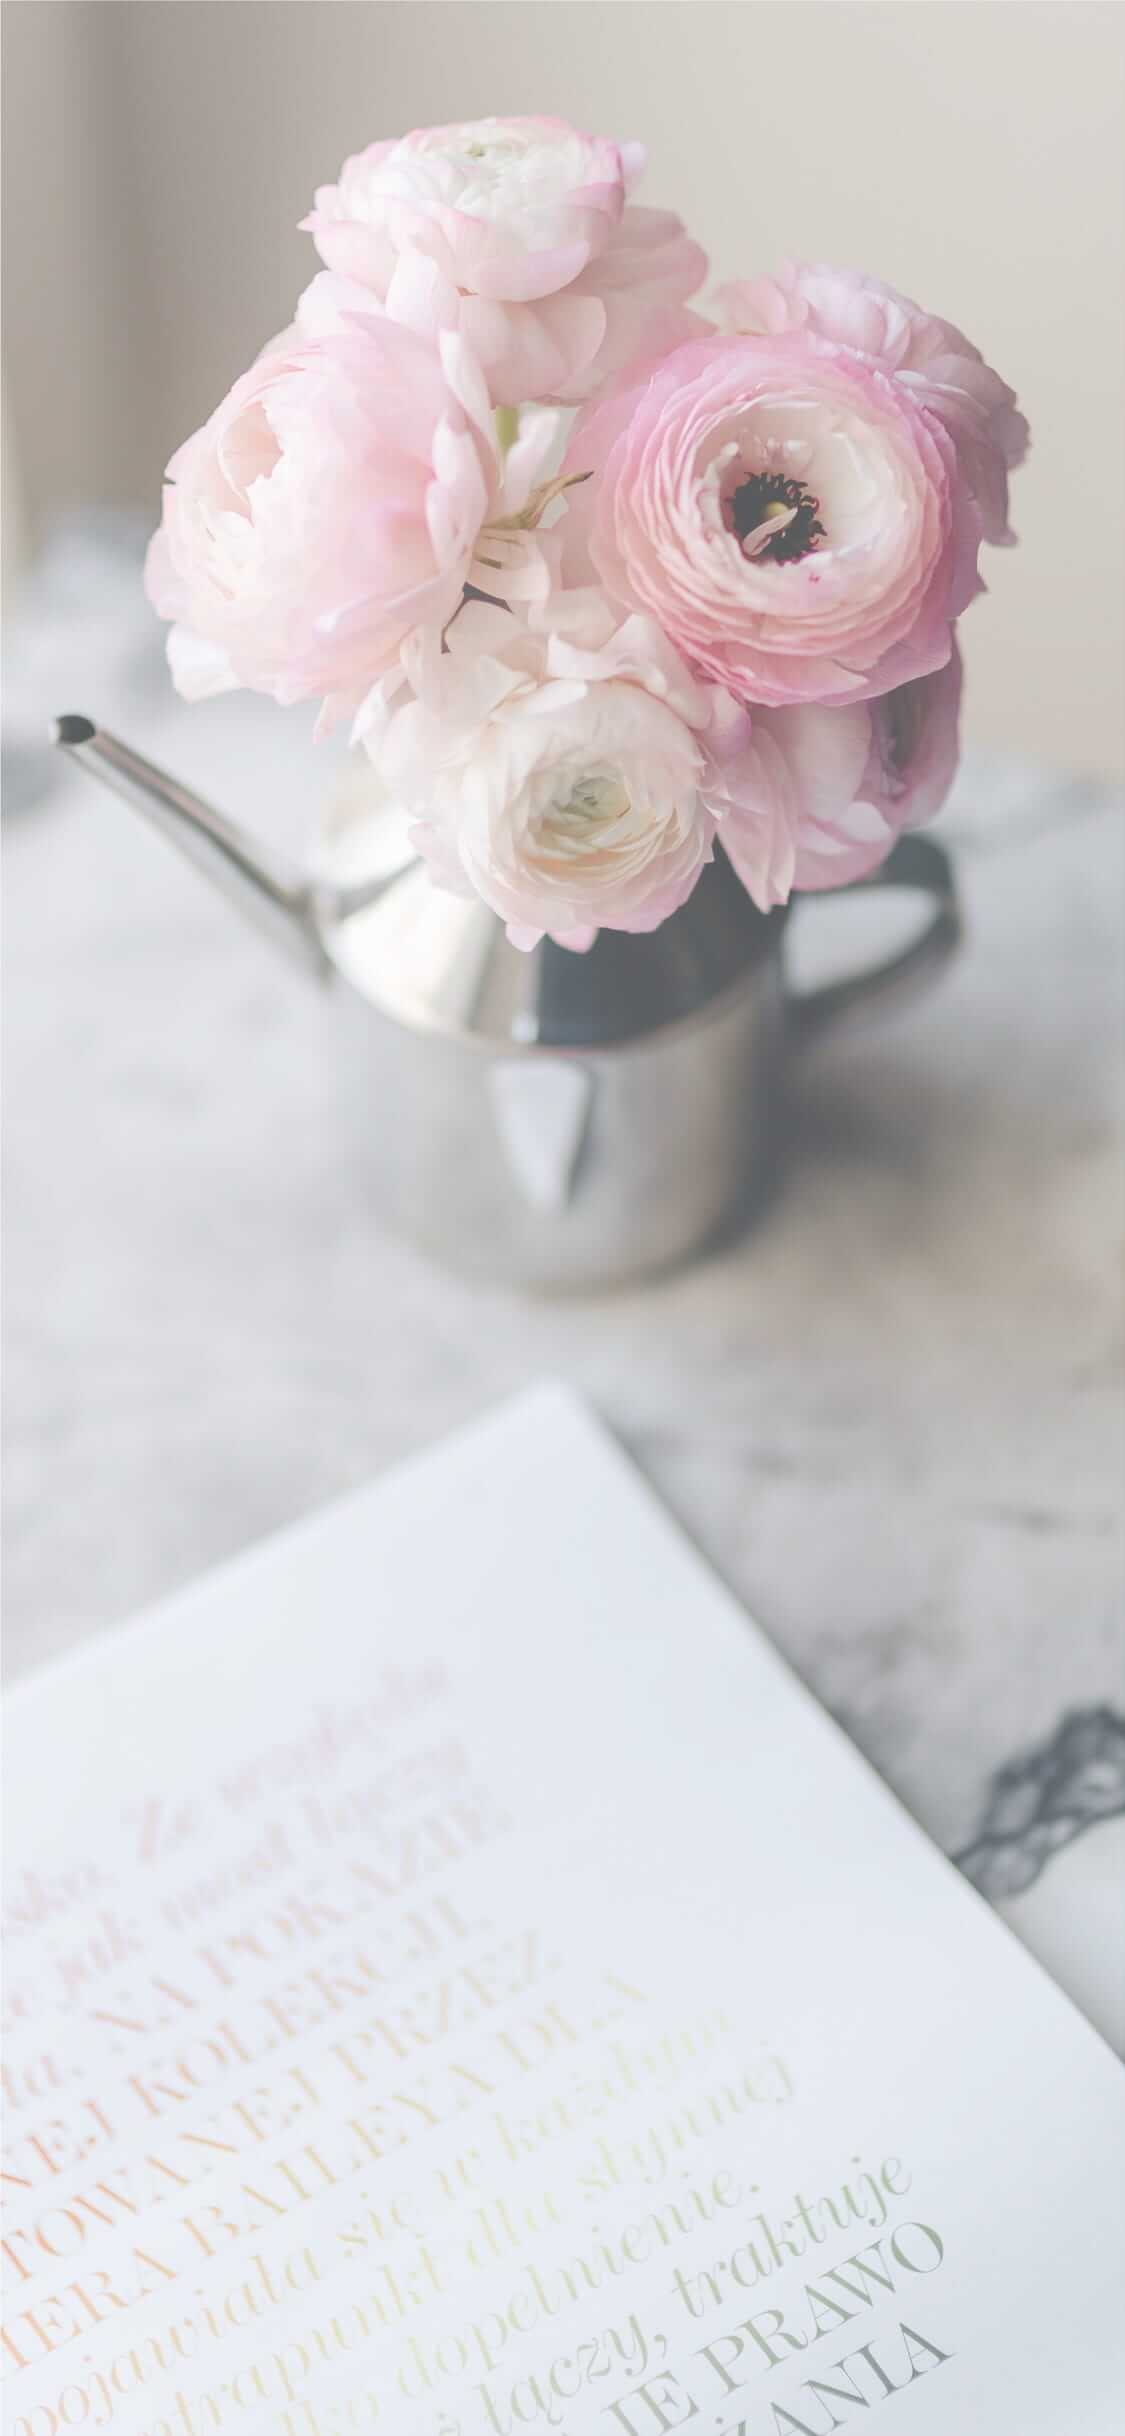 Iphone11pro Iphonexs Xロック画面等シンプルな花の無料壁紙配信中